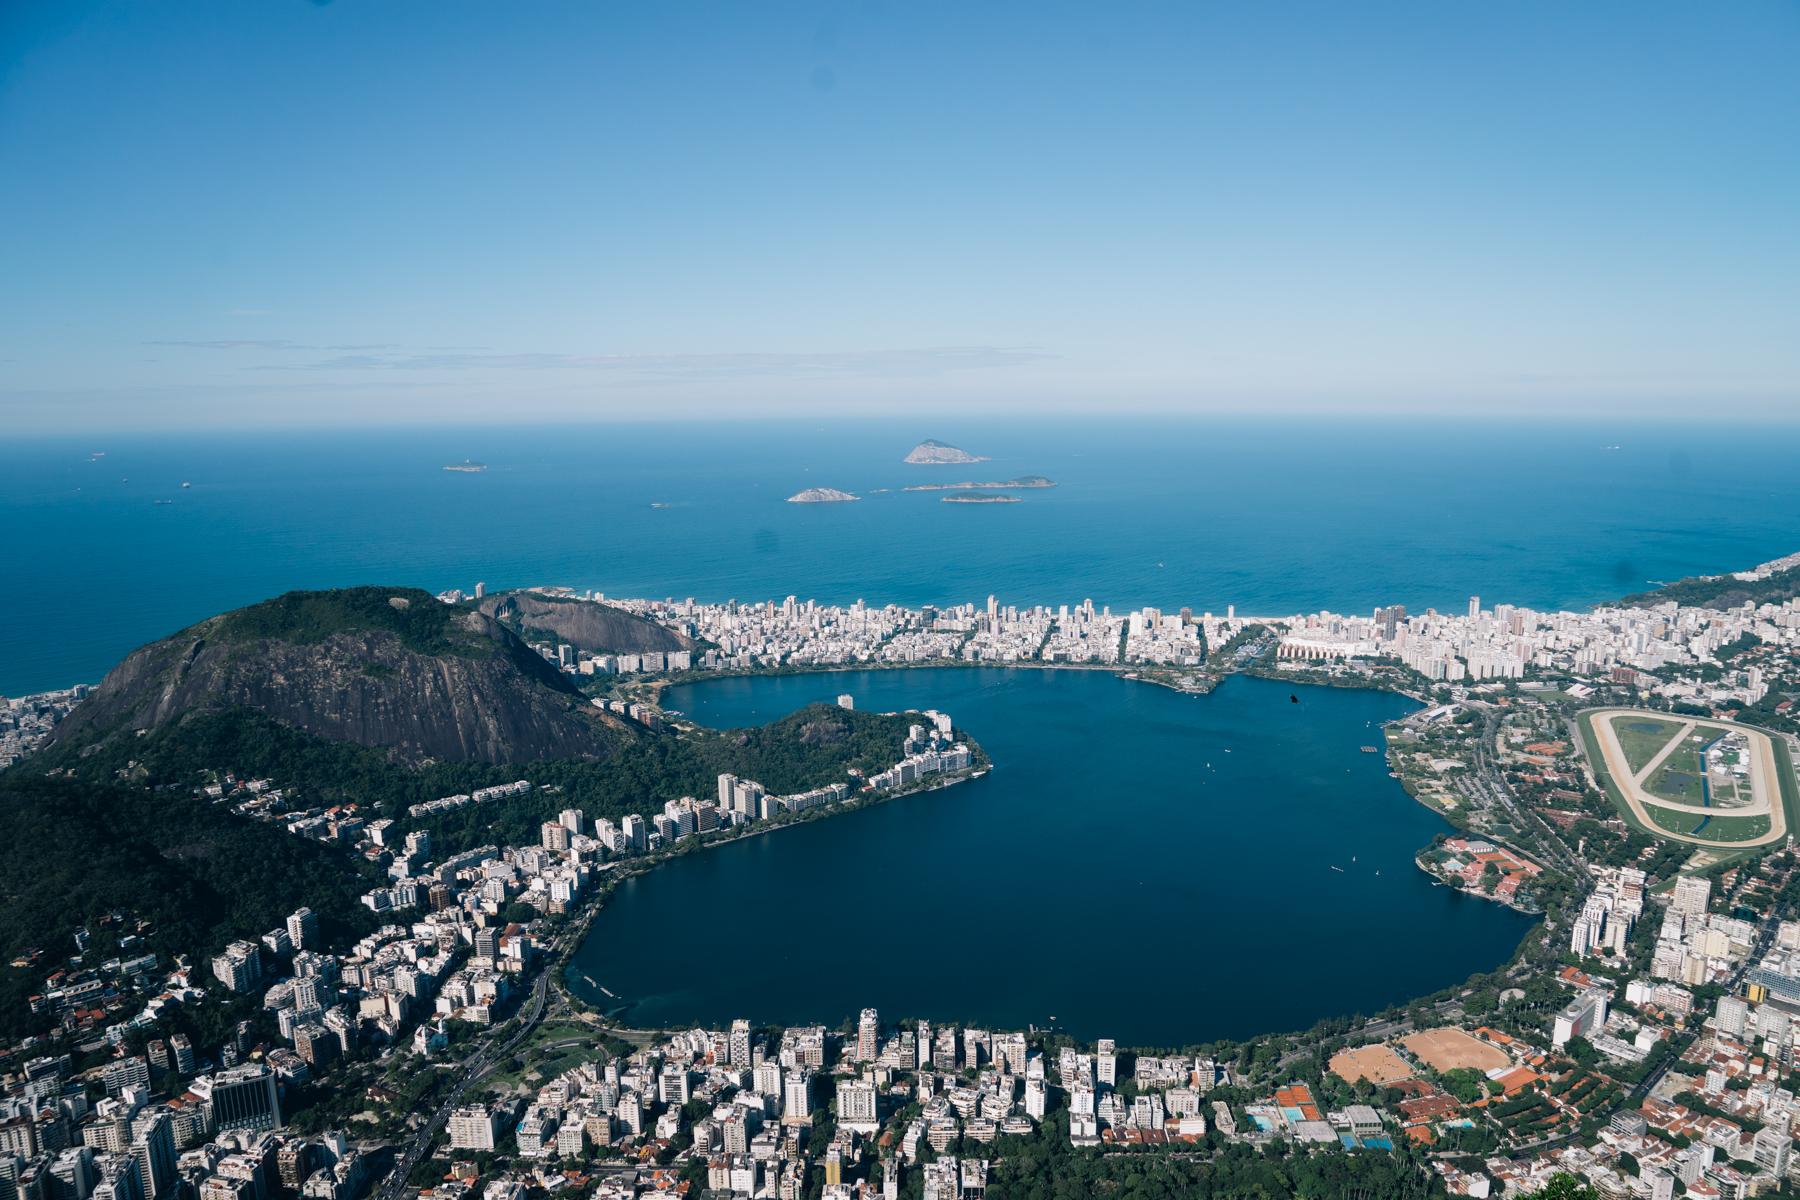 brazil-brasil-world-cup-olympics-rio-de-janeiro-sugar-loaf-corcovad-christ-redeemer-christo-redentor-12